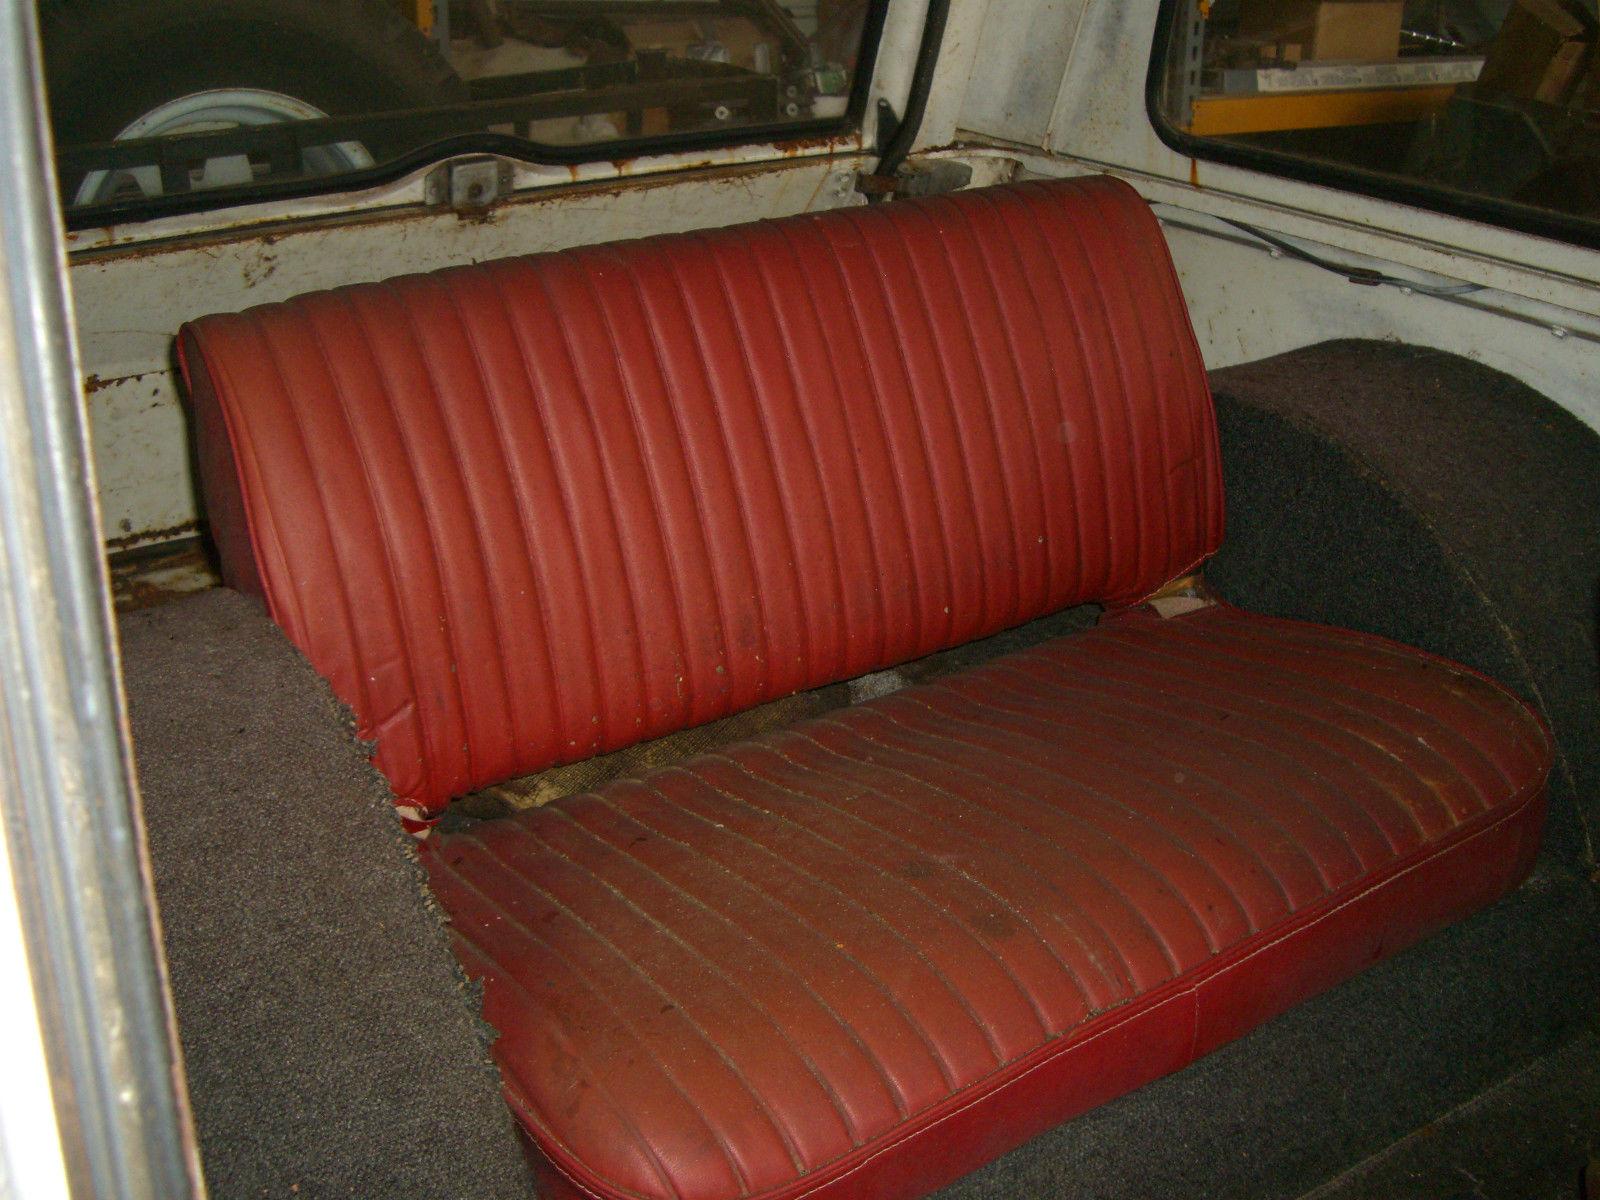 1971-Jeepster-Commando-Hurst-rear-seat